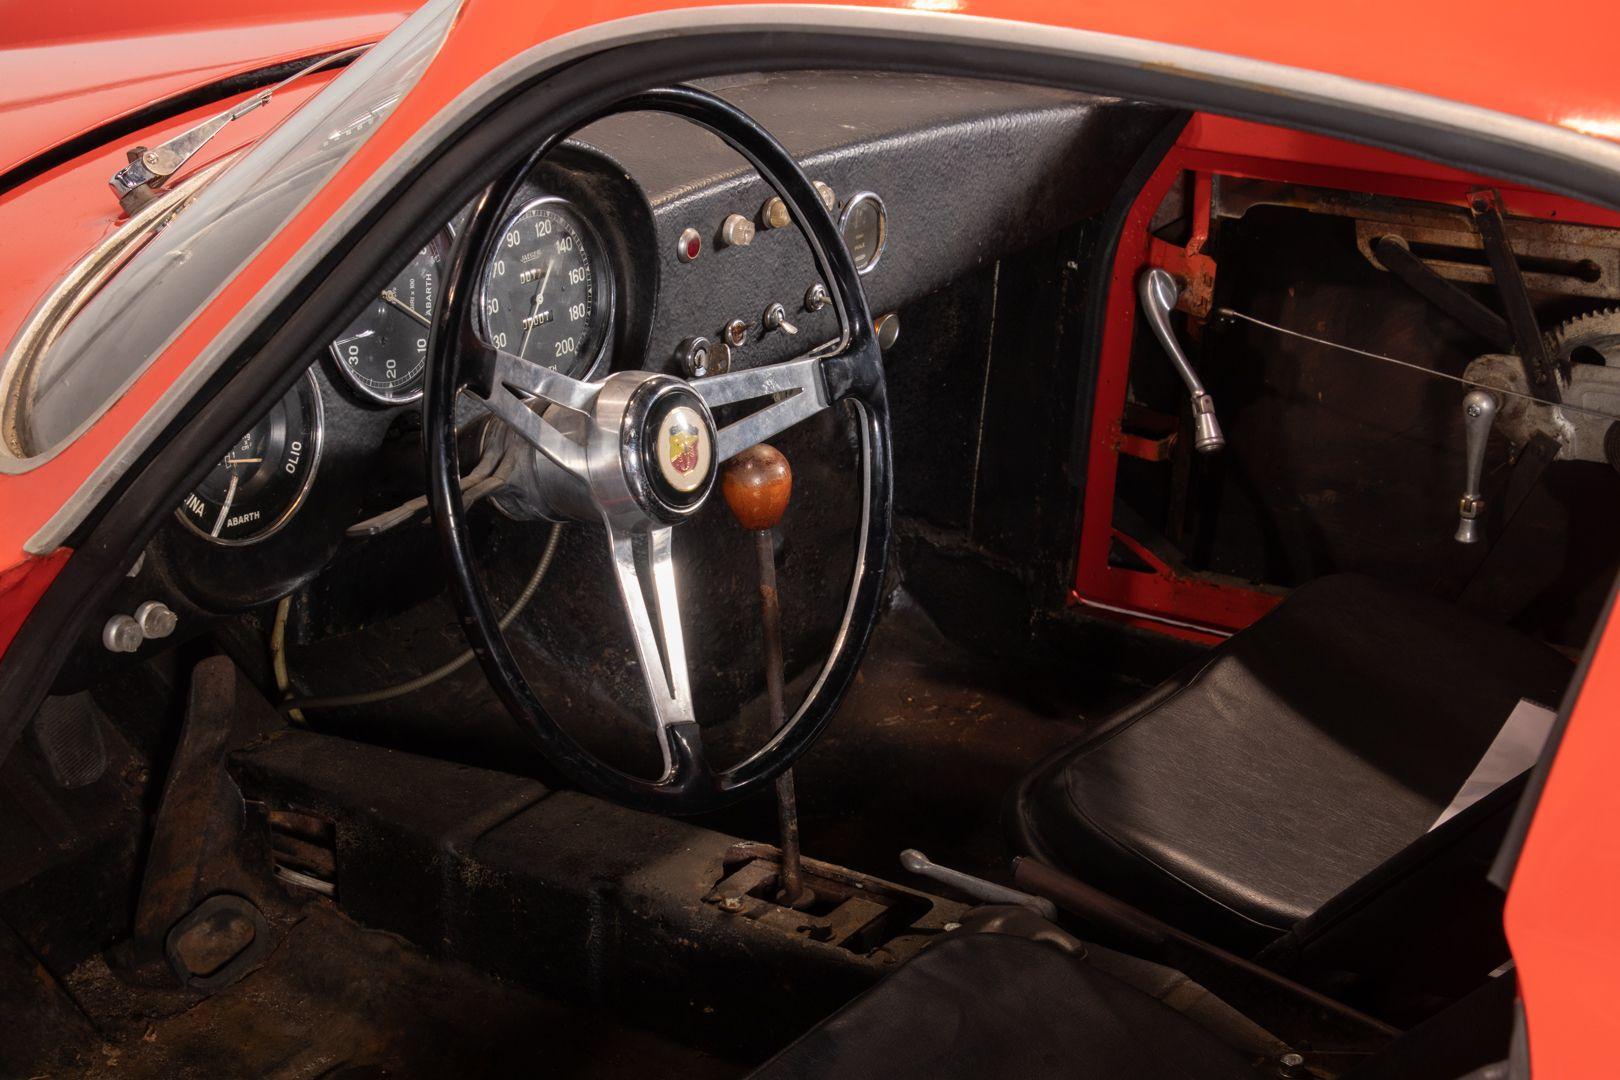 1960 Fiat Abarth 750 Bialbero record Monza 33325